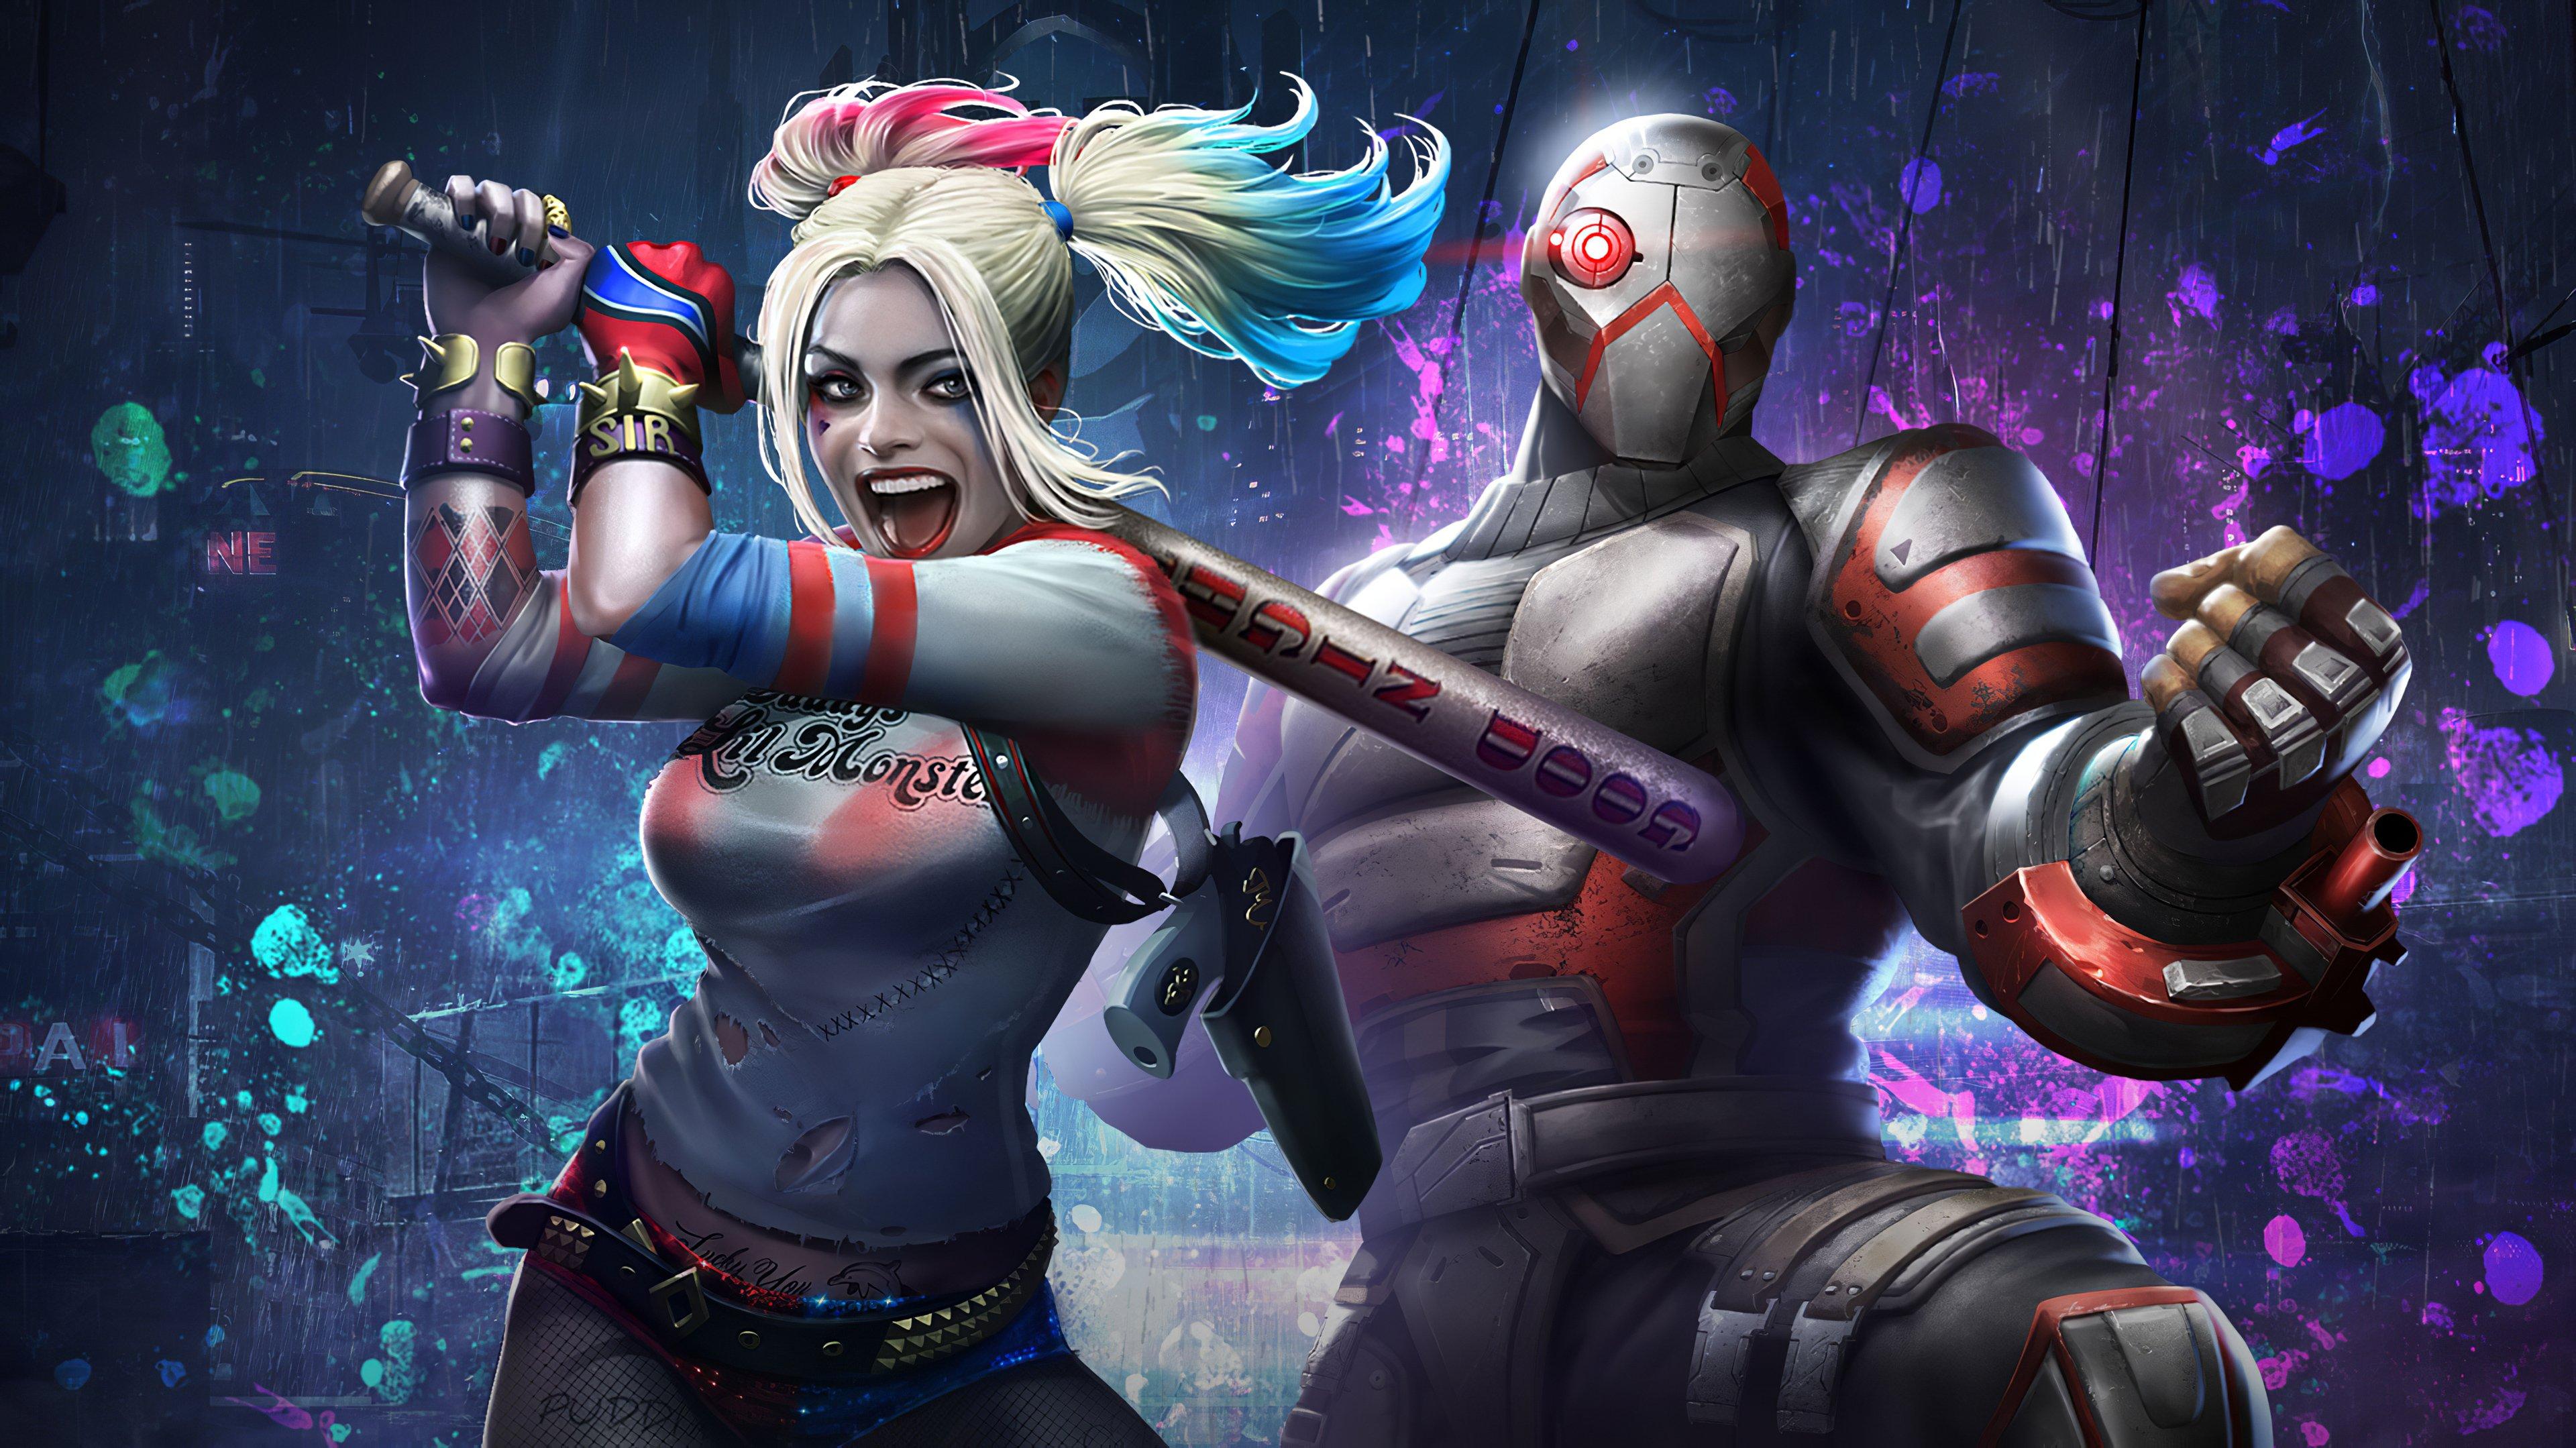 Fondos de pantalla Harley Quinn y Deadshot Injustice 2